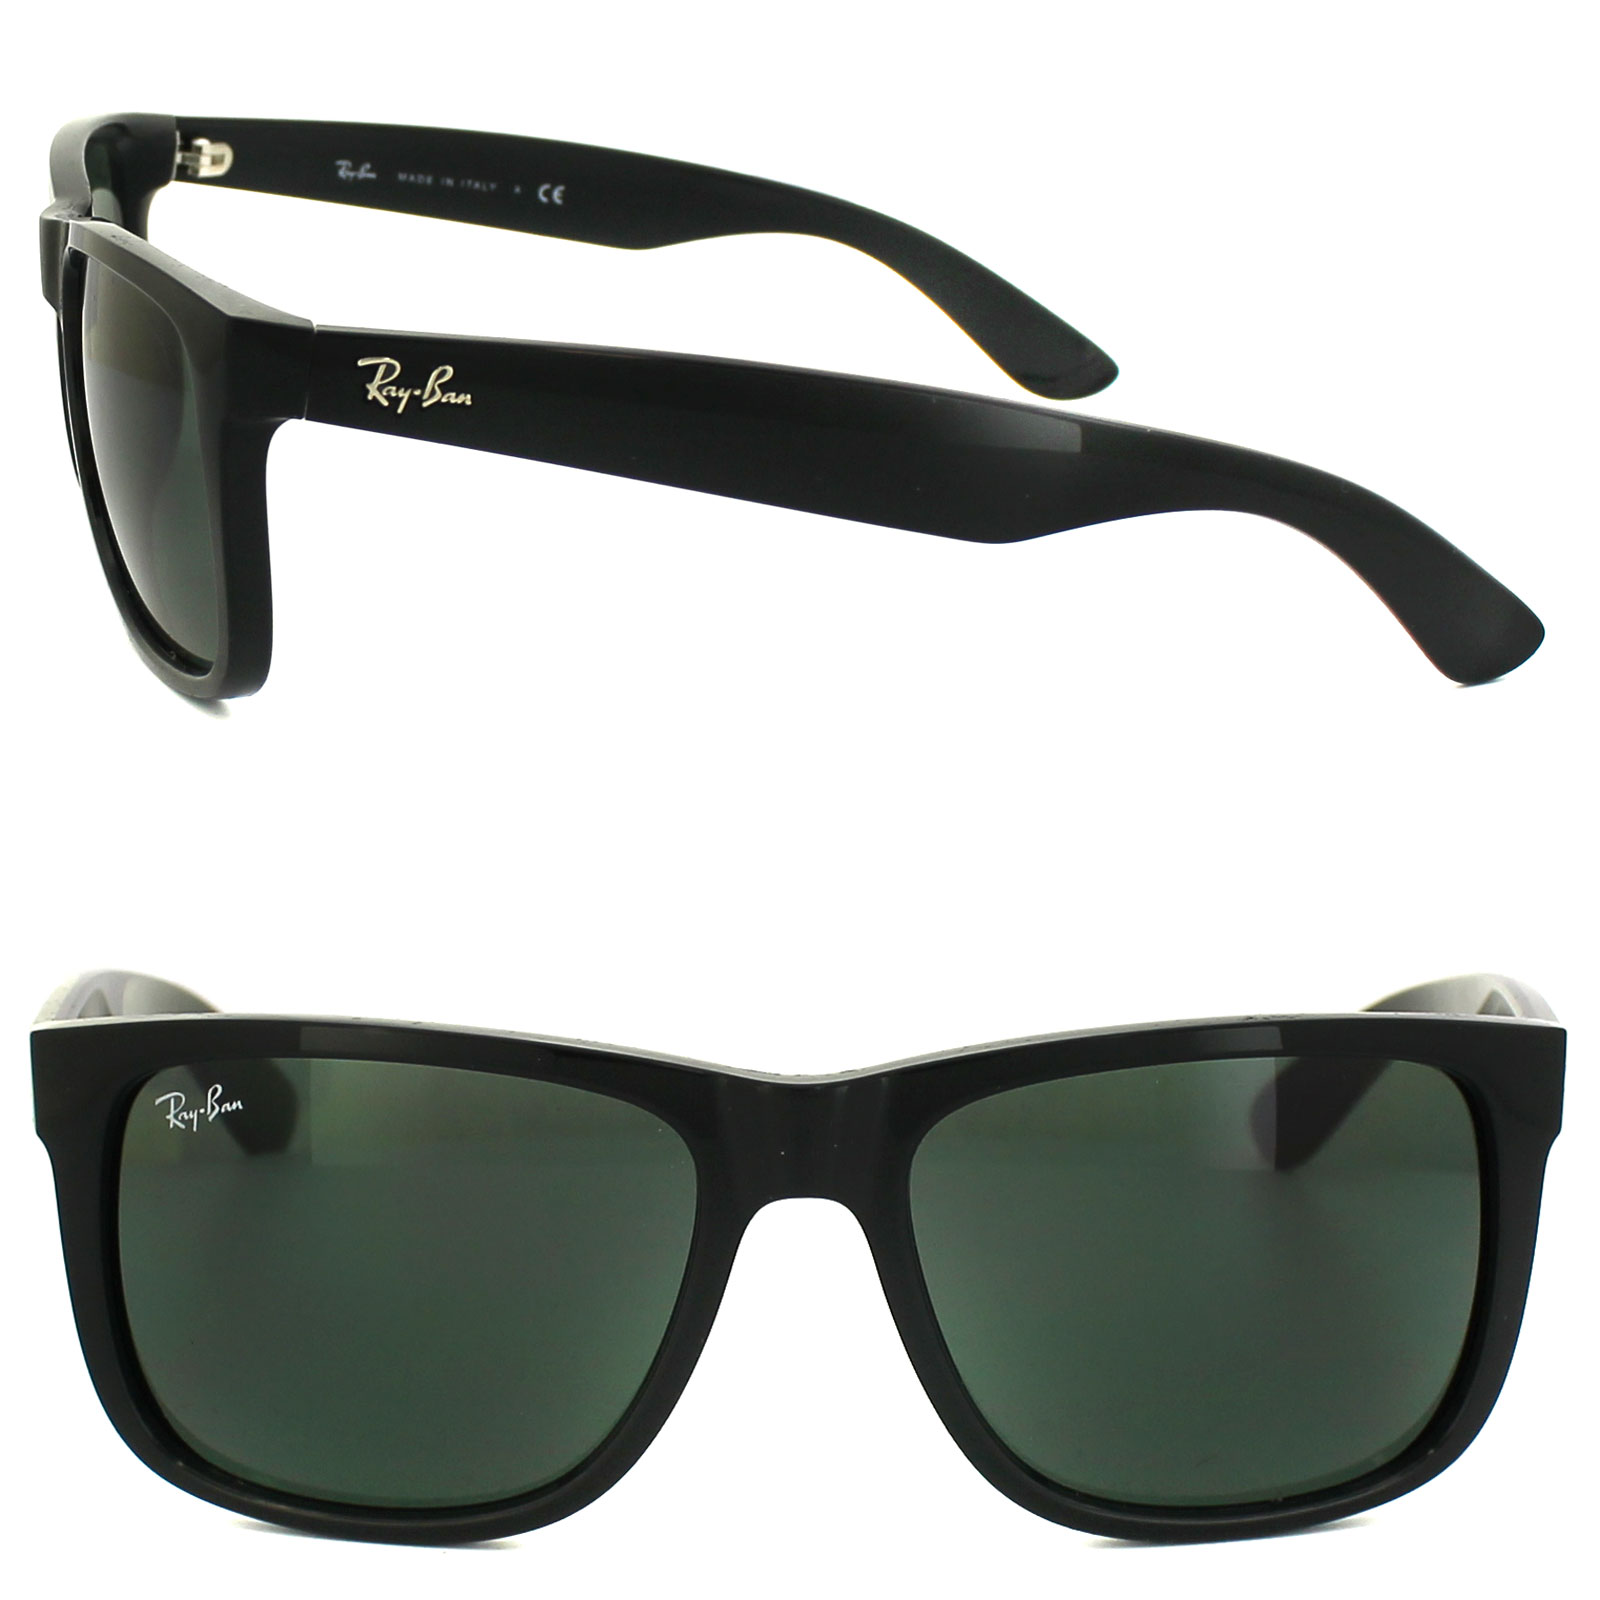 Sentinel Ray-Ban Sunglasses Justin 4165 601 71 Shiny Black Green Large 55mm c67d4d82d5b1